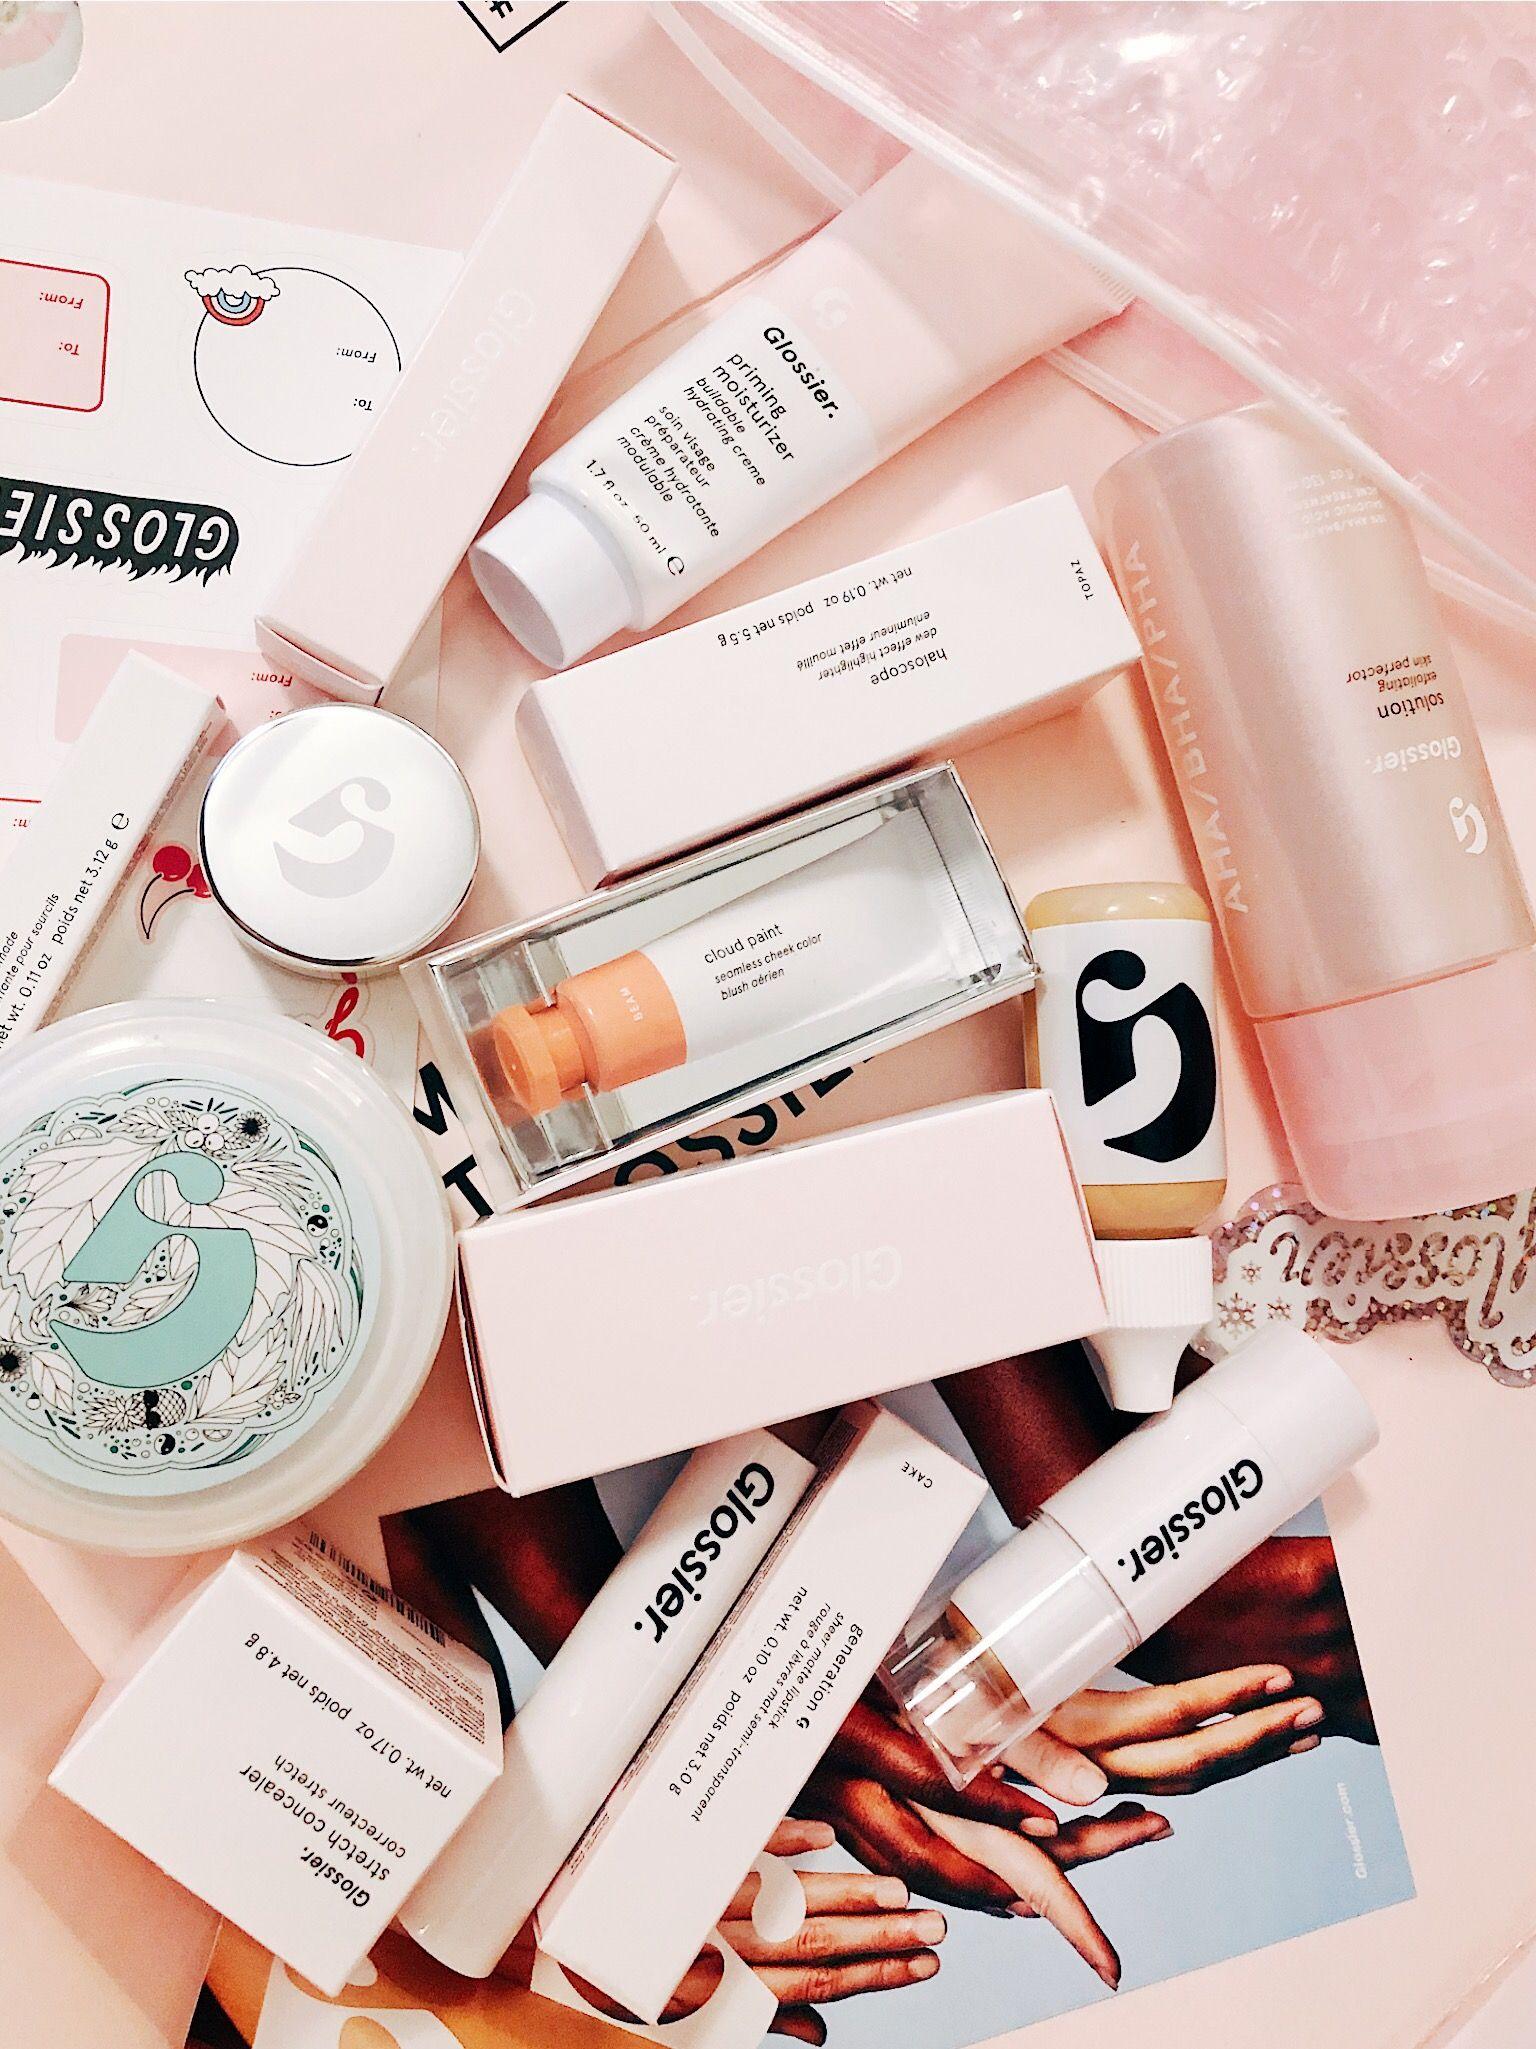 Pin by ♡ αѕρуη мαяιє ♡ on skincare in 2020 Makeup skin